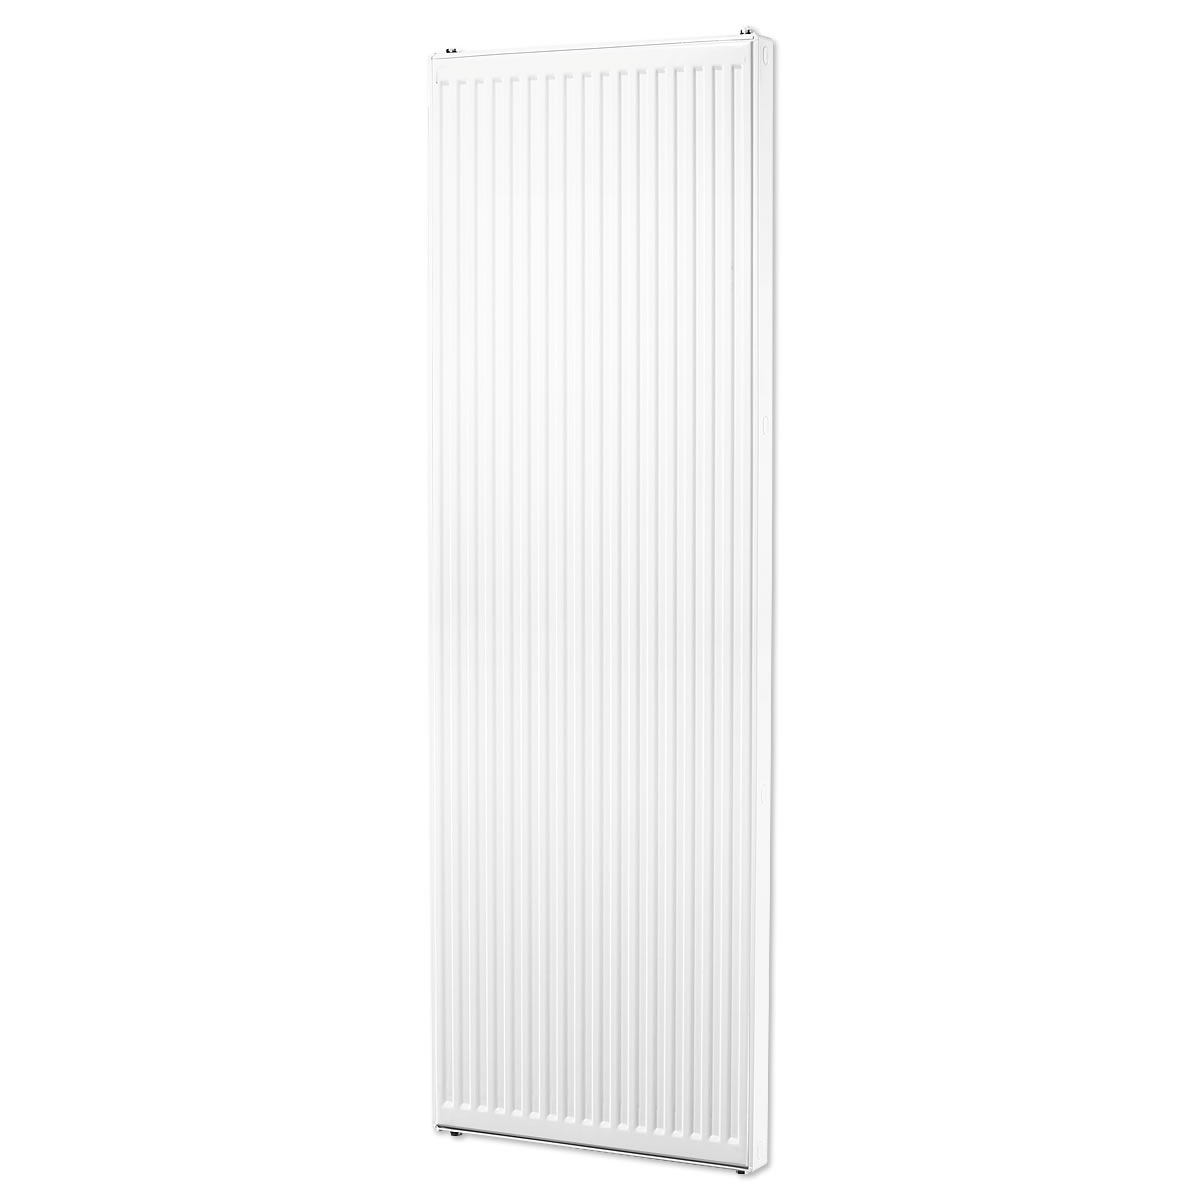 buderus logatrend cv profil vertikal heizk rper h mm l 500 mm typ 21 1377 863 watt. Black Bedroom Furniture Sets. Home Design Ideas